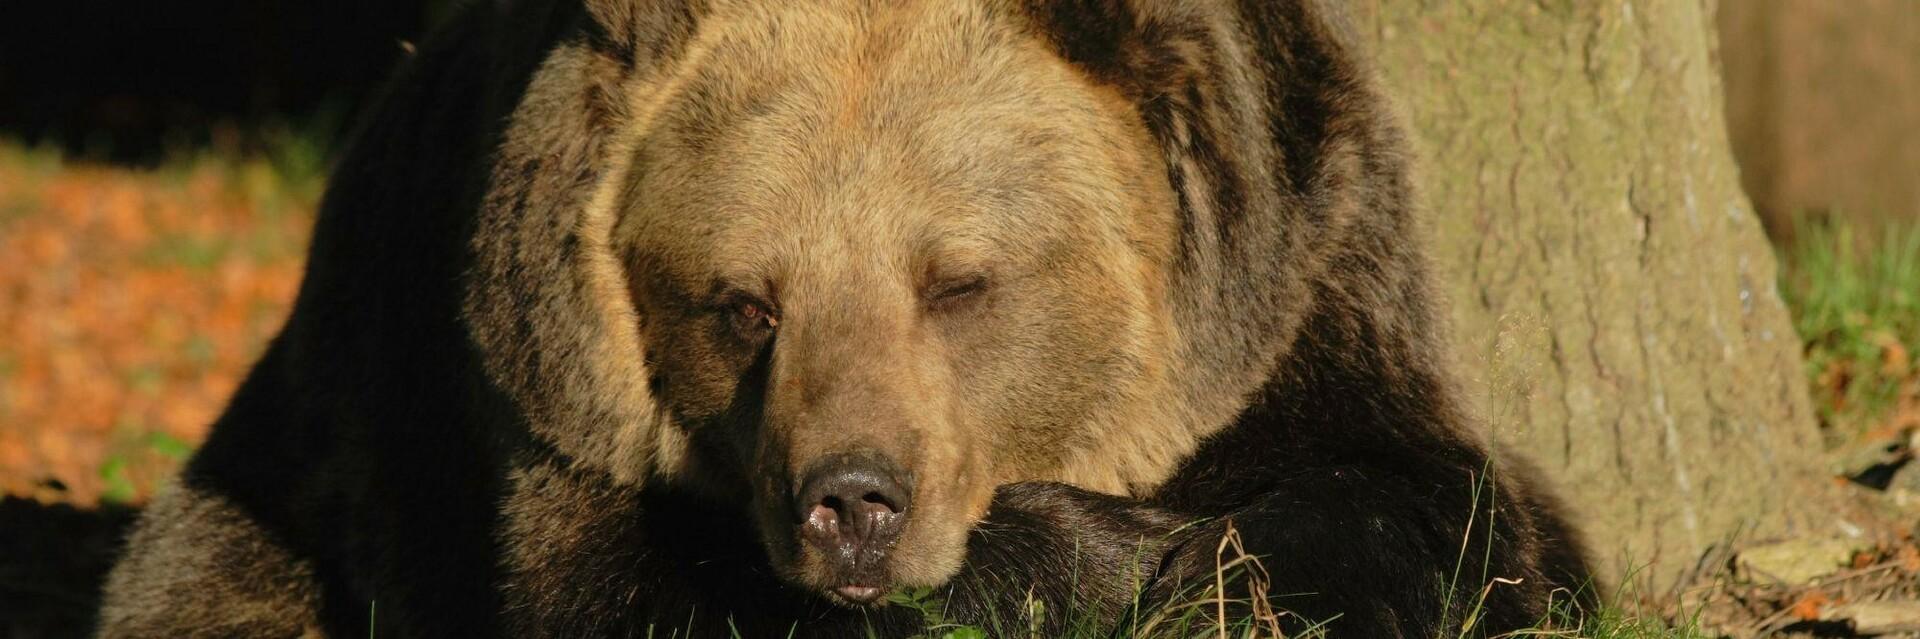 Brumca at BEAR SANCTUARY Arbesbach